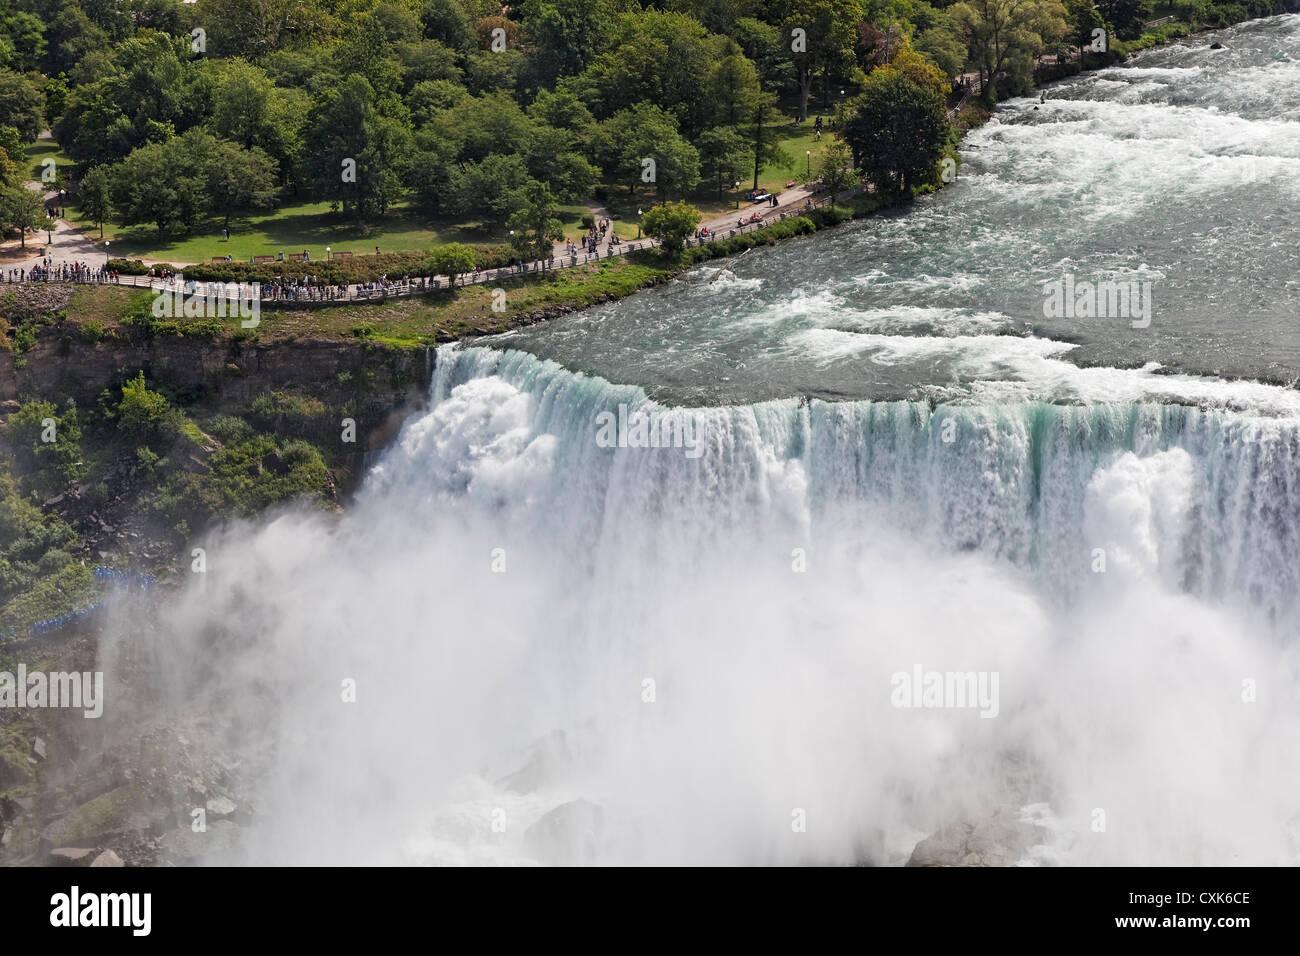 Besucher bei den American Falls in Niagara Falls. Stockbild